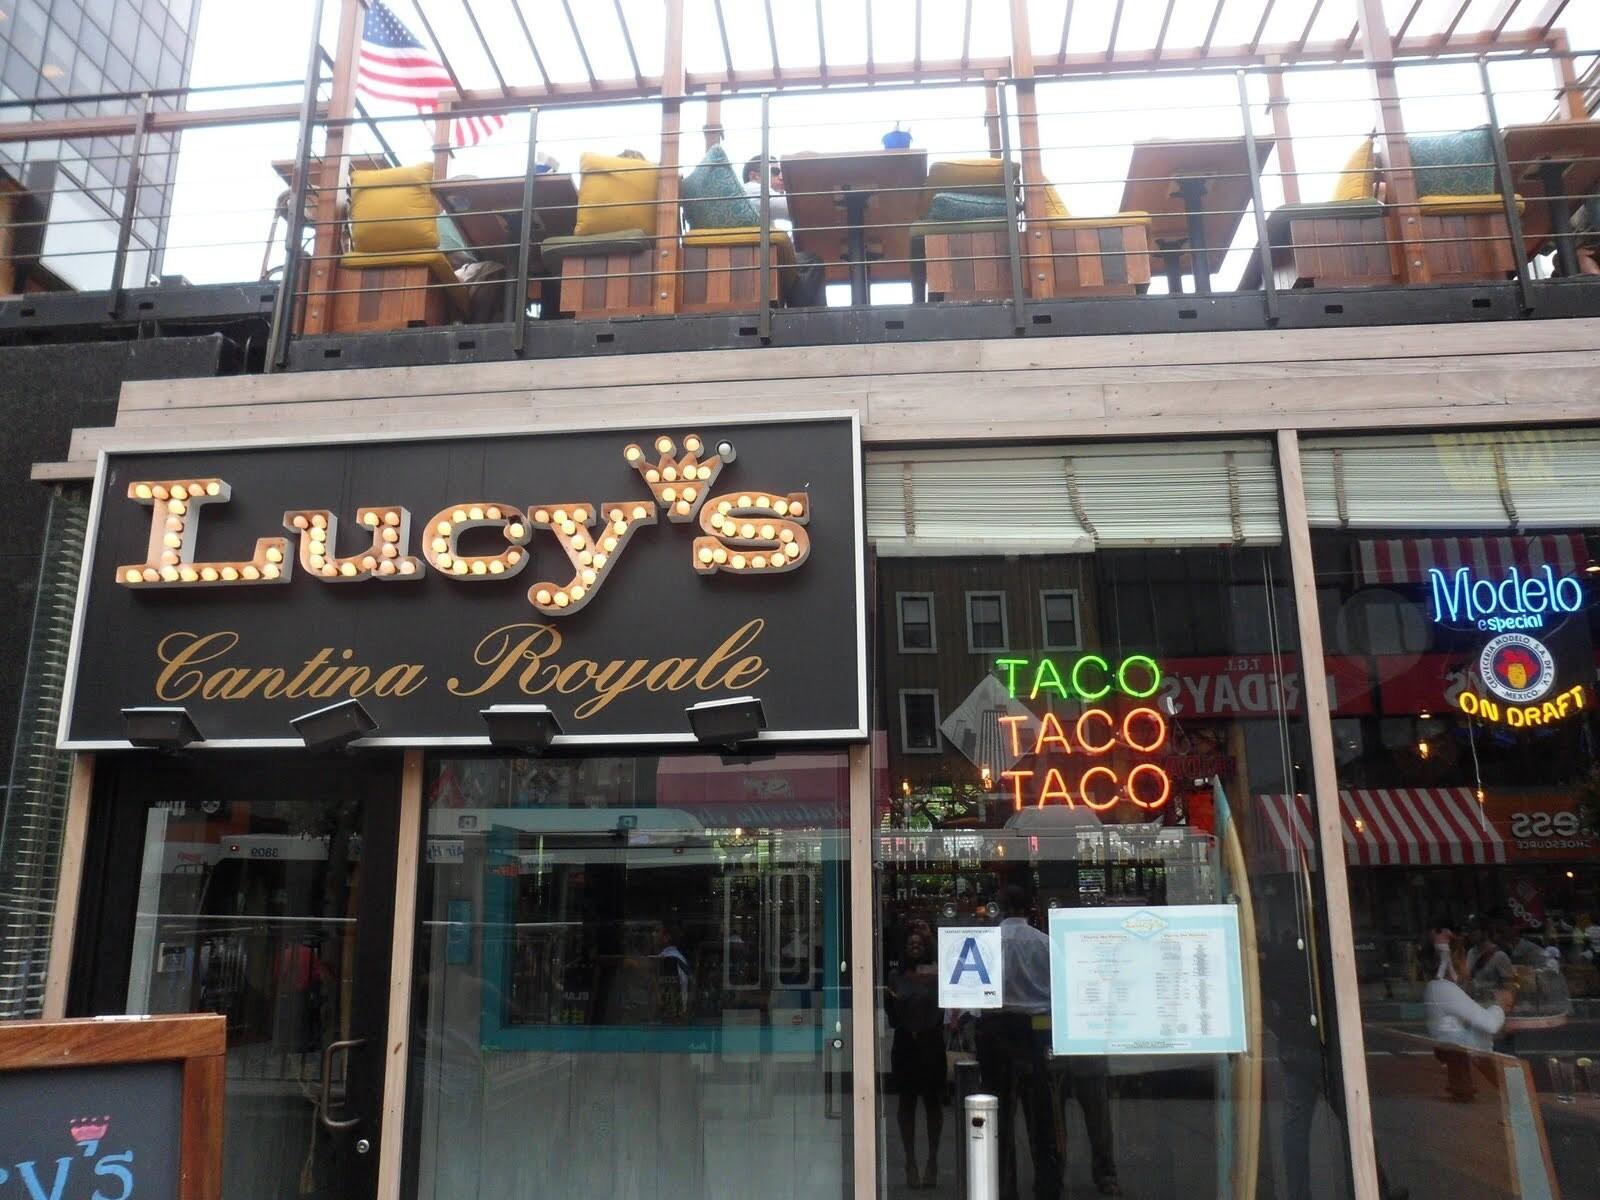 Сотрудницу ресторана в Нью-Йорке уволили из-за «Путин-бургера»